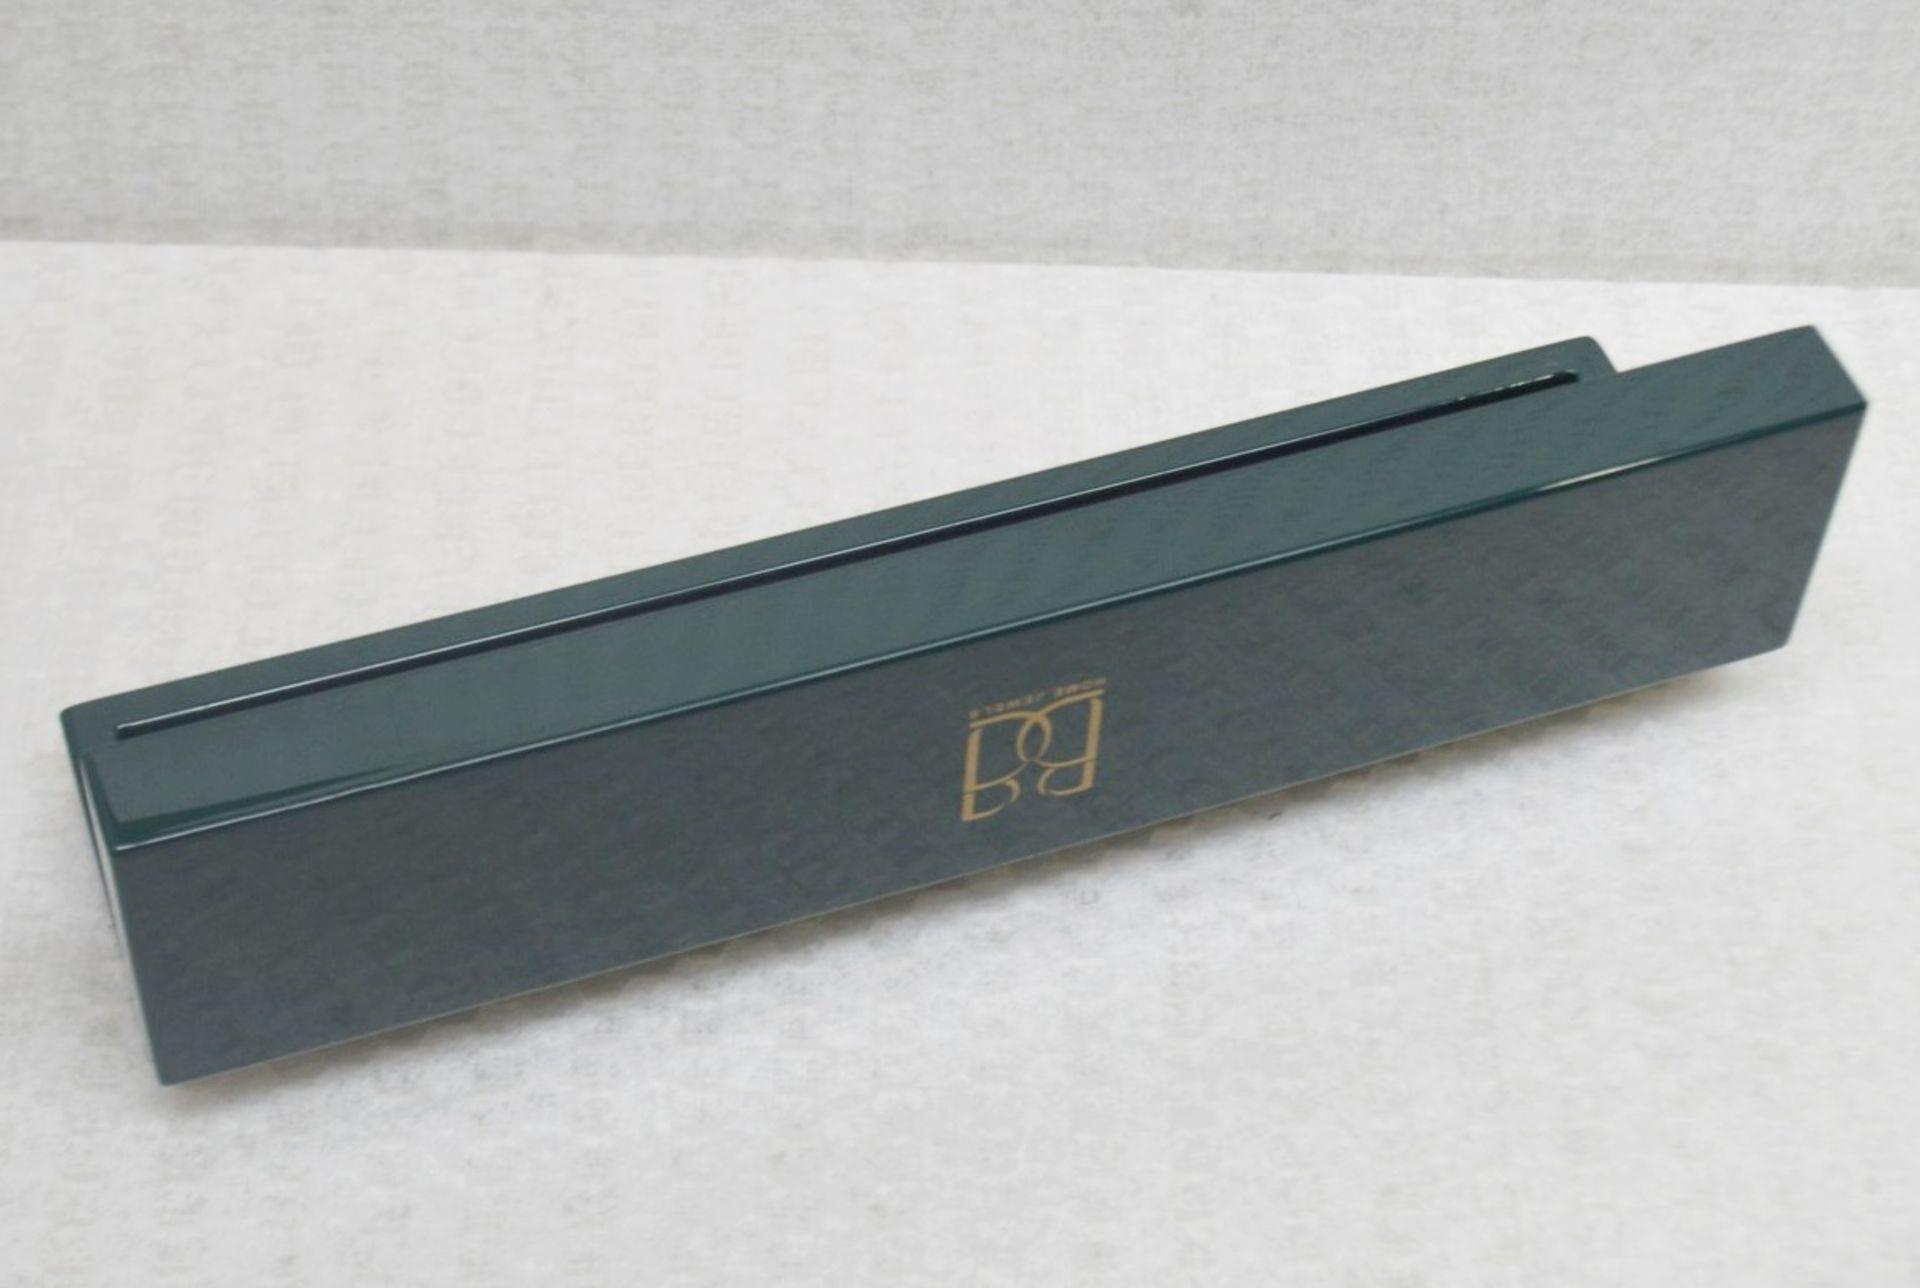 1 x BALDI 'Home Jewels' Italian Hand-crafted Artisan MISBAHA Prayer Beads In Amethyst Gemstone And - Image 3 of 7